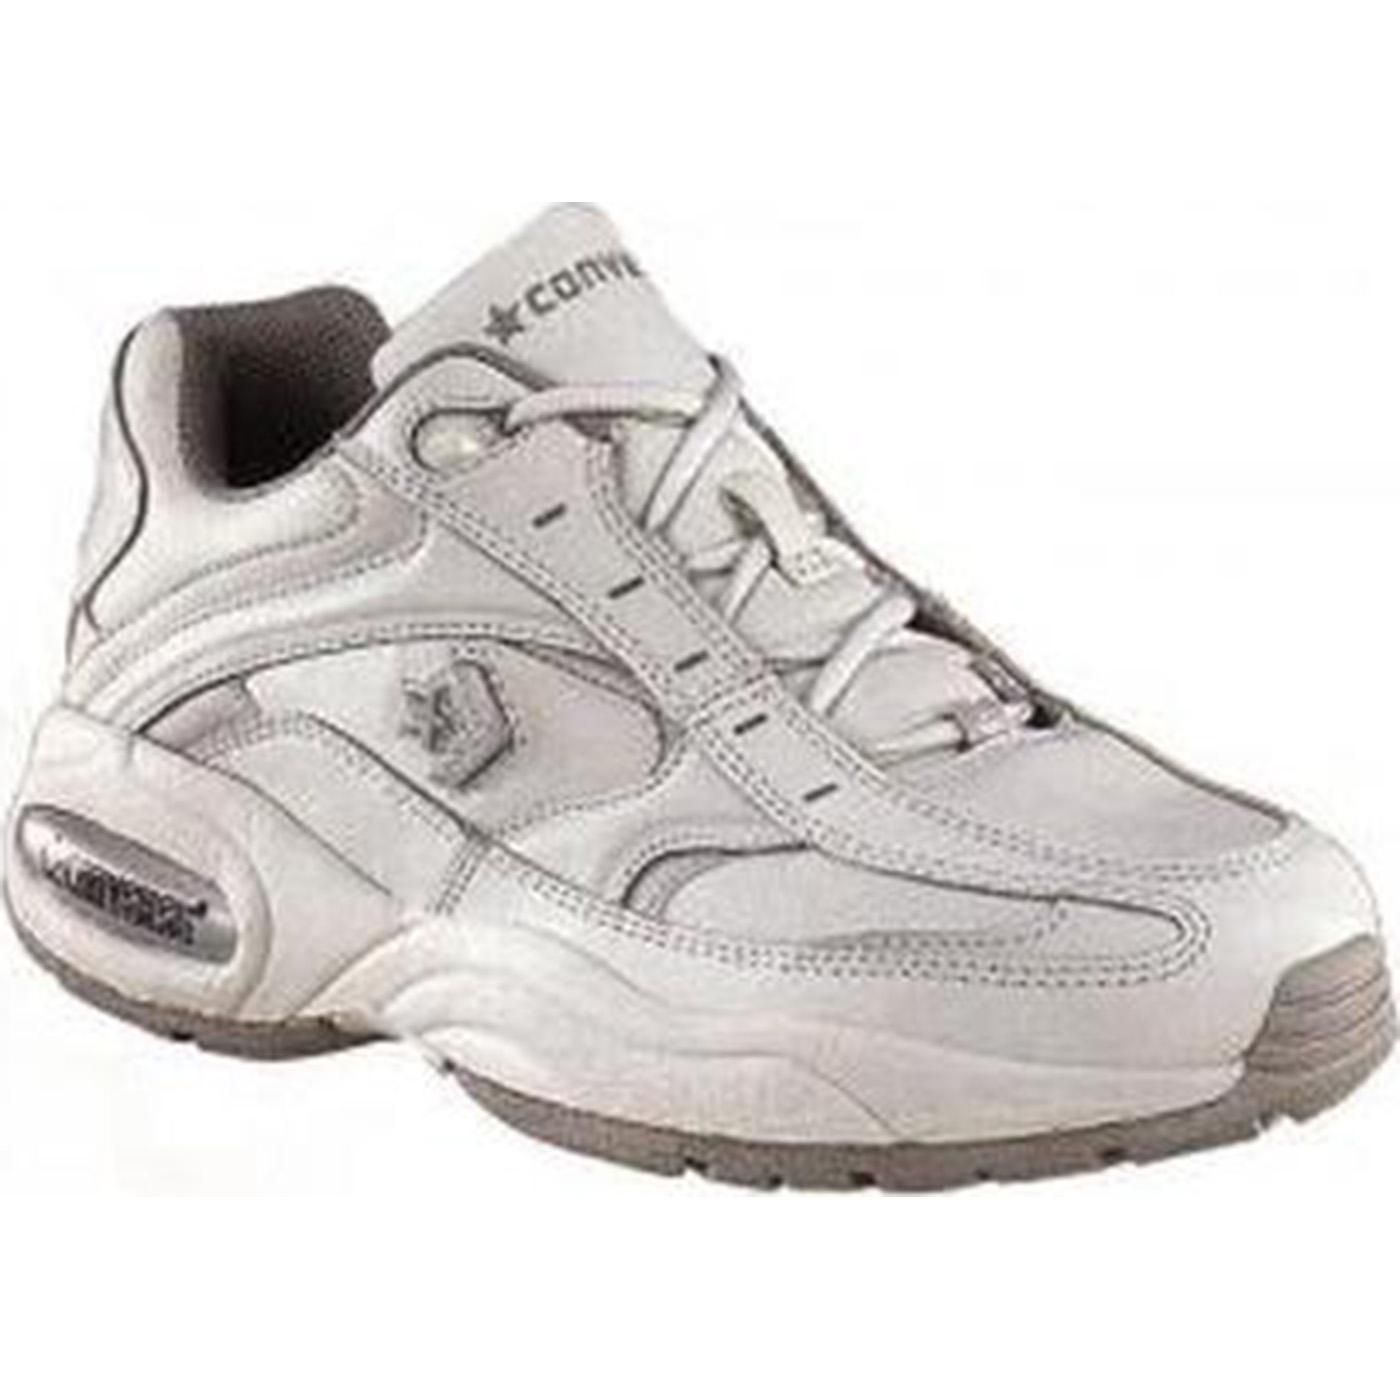 66ed92f3d86d76 Converse composite toe static dissipative work shoe large jpg 1400x1400 Converse  composite